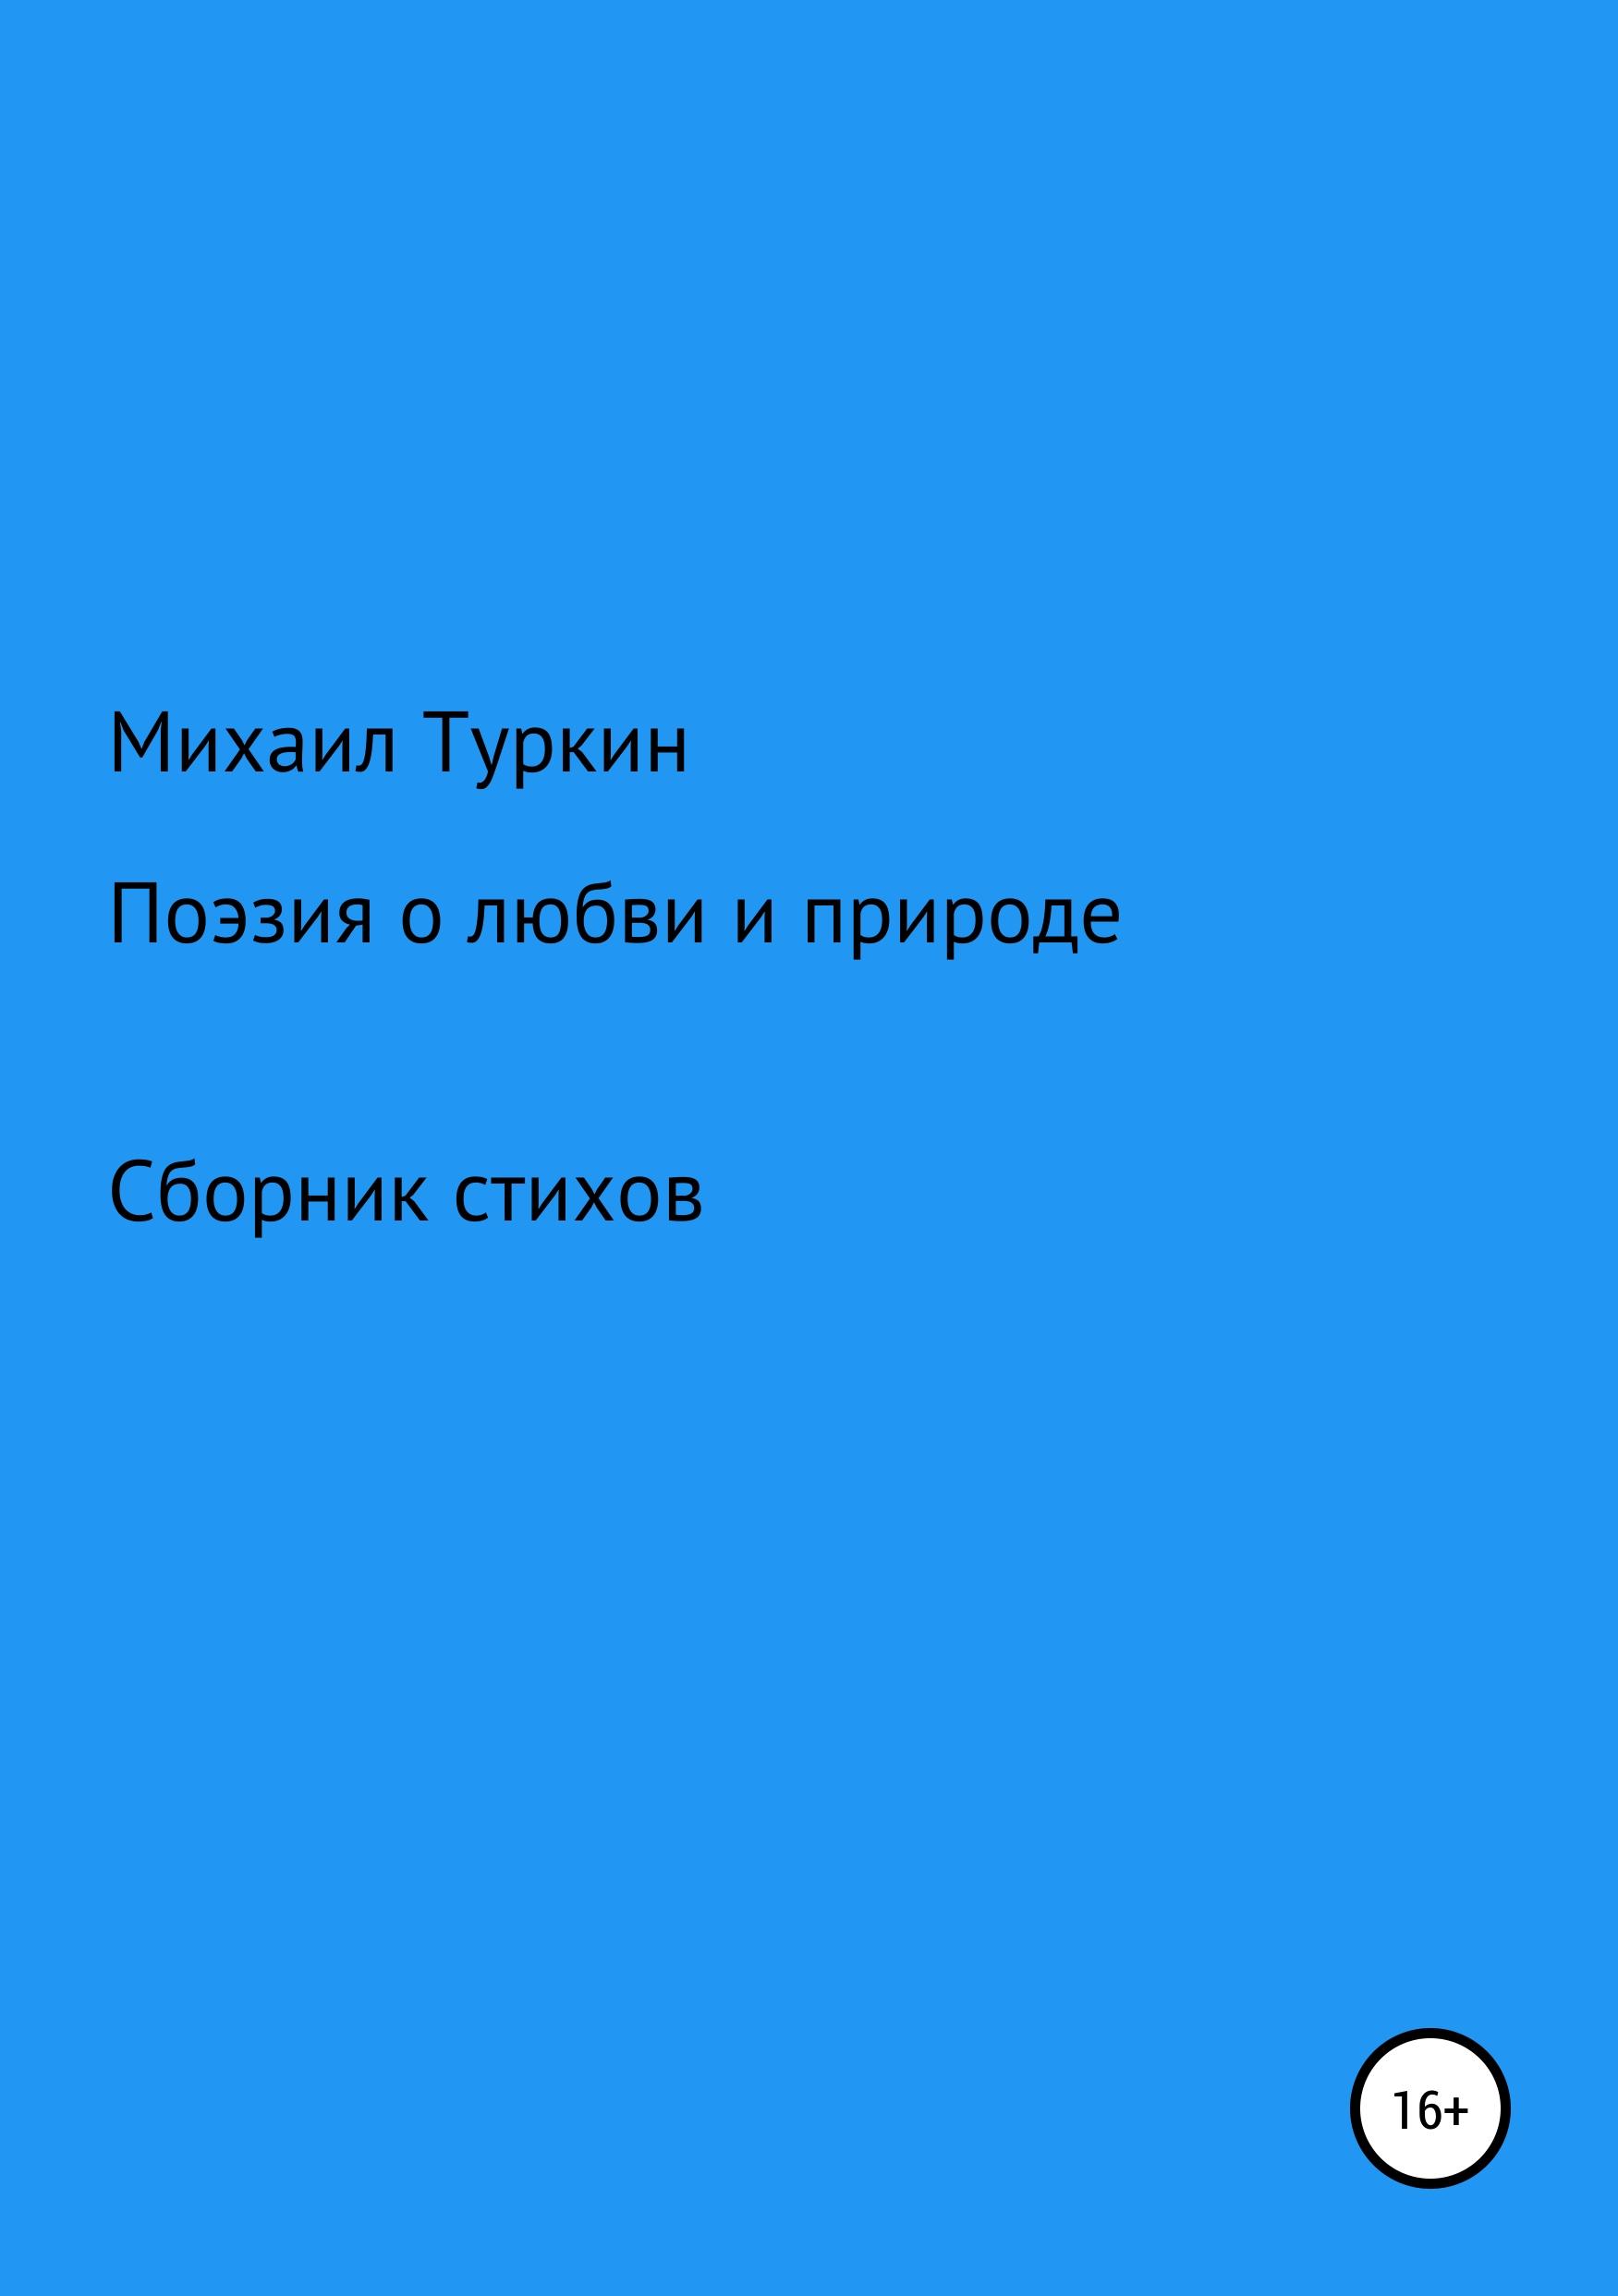 цена на Михаил Борисович Туркин Стихи о любви и природе